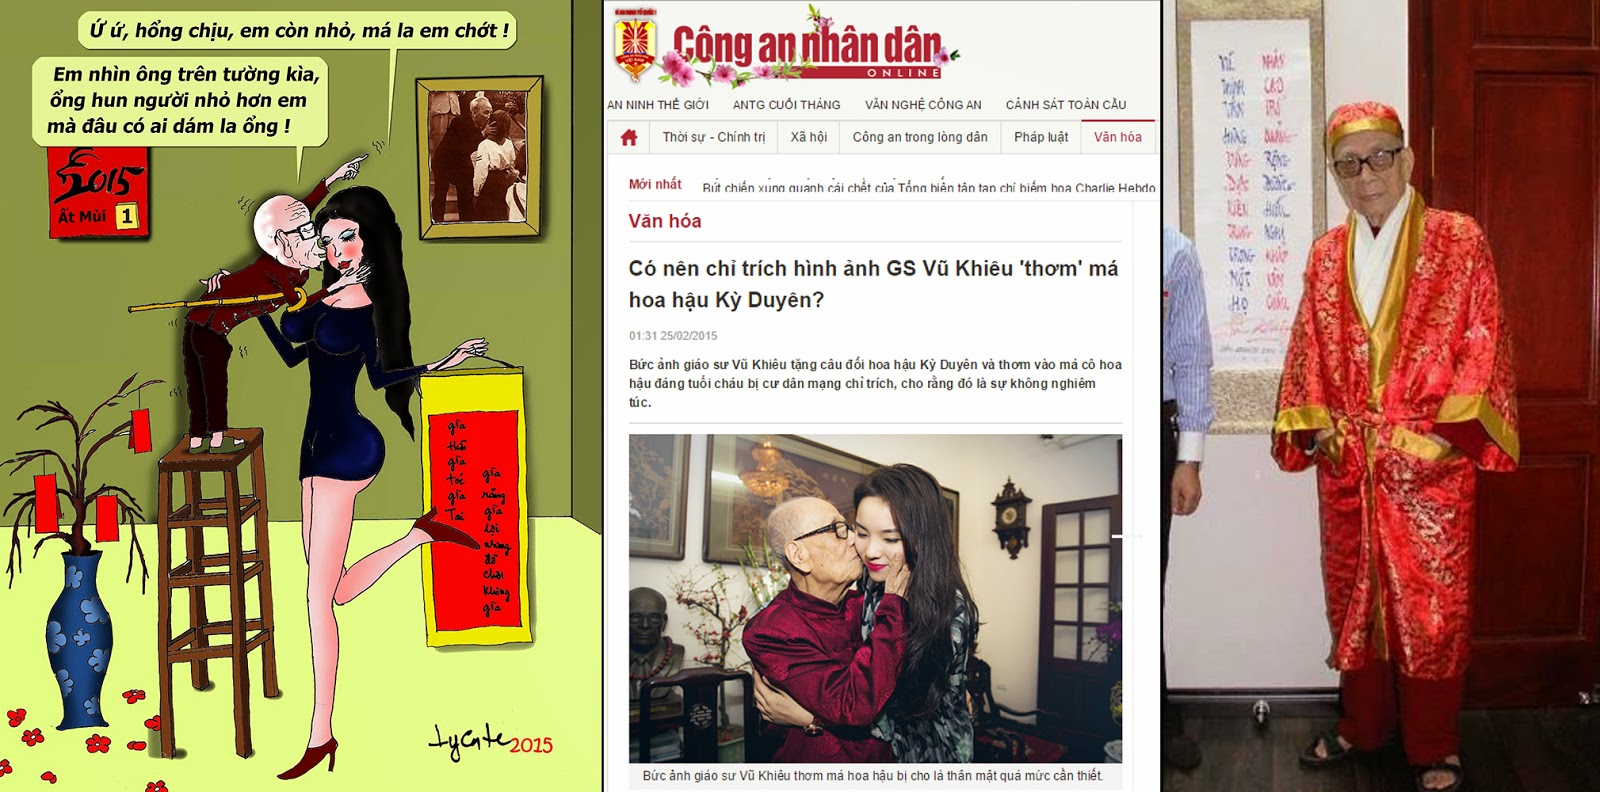 Dan Lam Bao Dang Chi Hung Wwwmiifotoscom